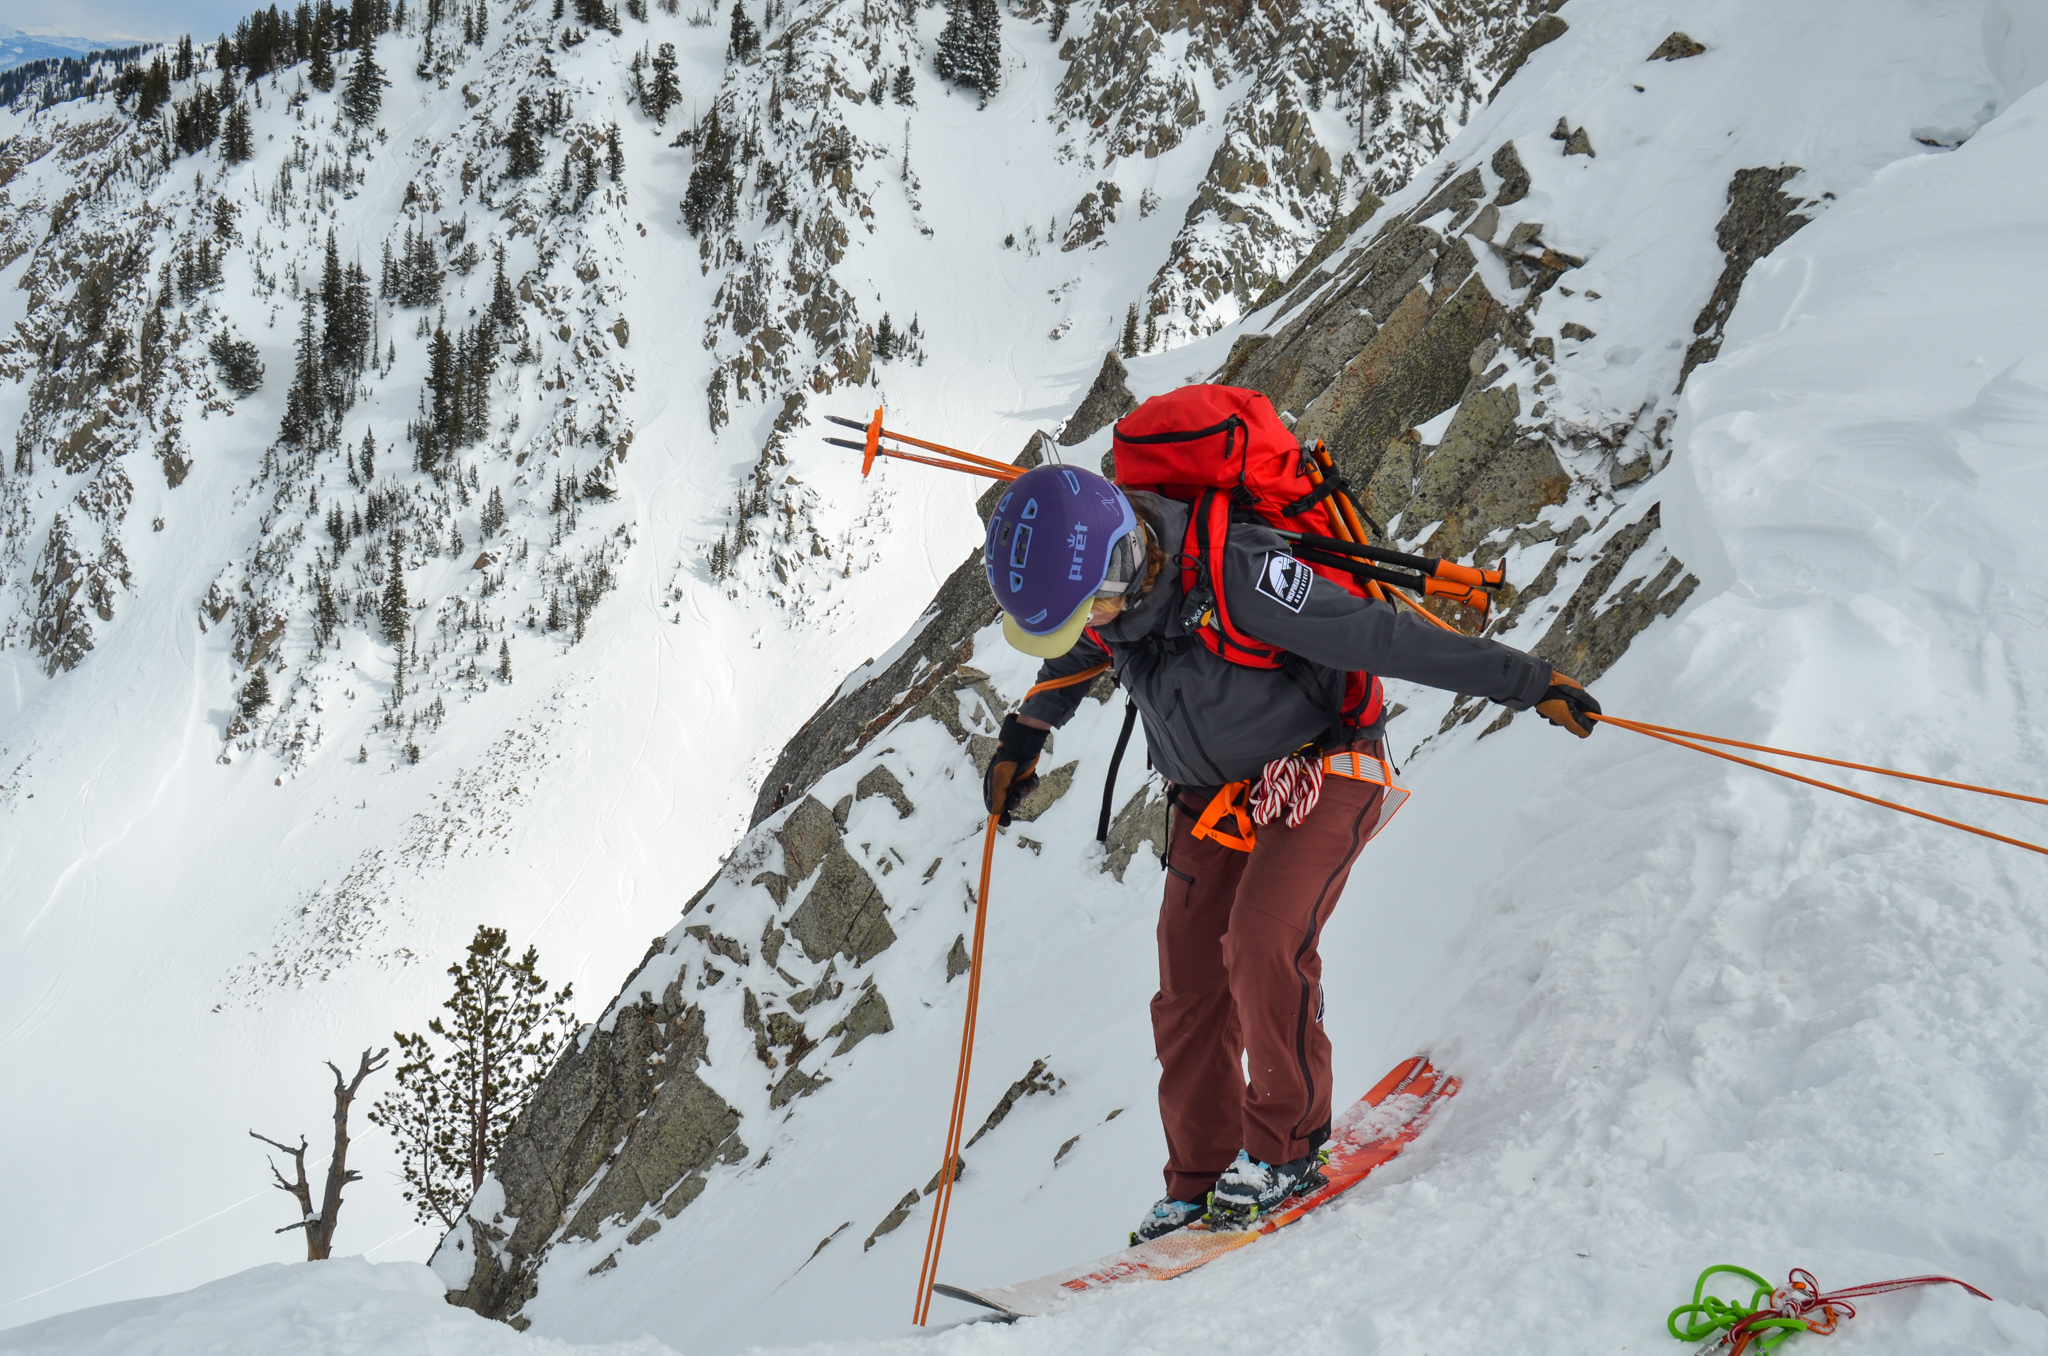 ski mountaineering lower2